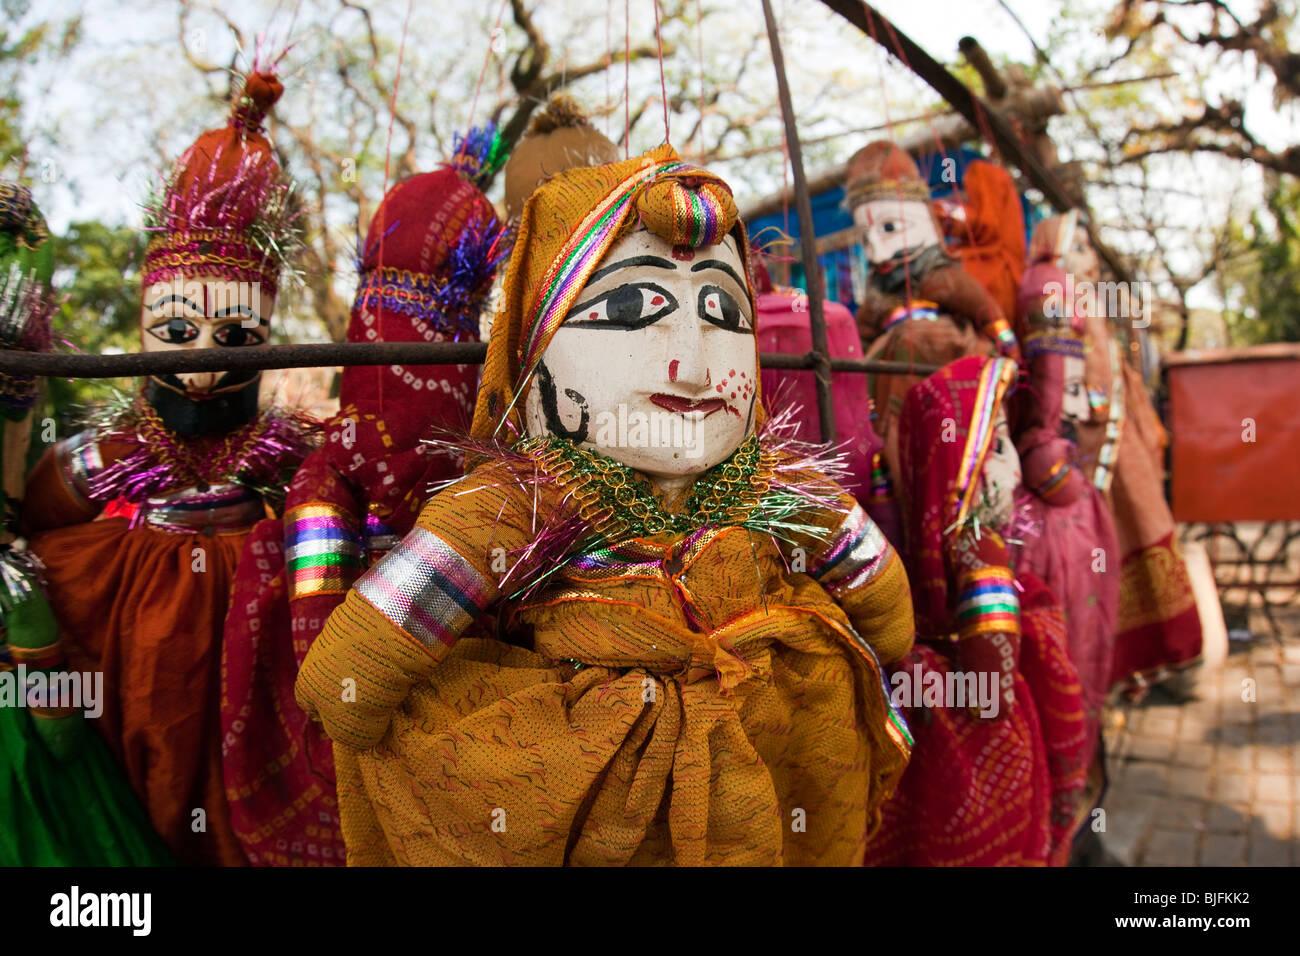 Indien, Kerala, Kochi, Fort Cochin, preiswerte Souvenir Puppen zum Verkauf Stockbild